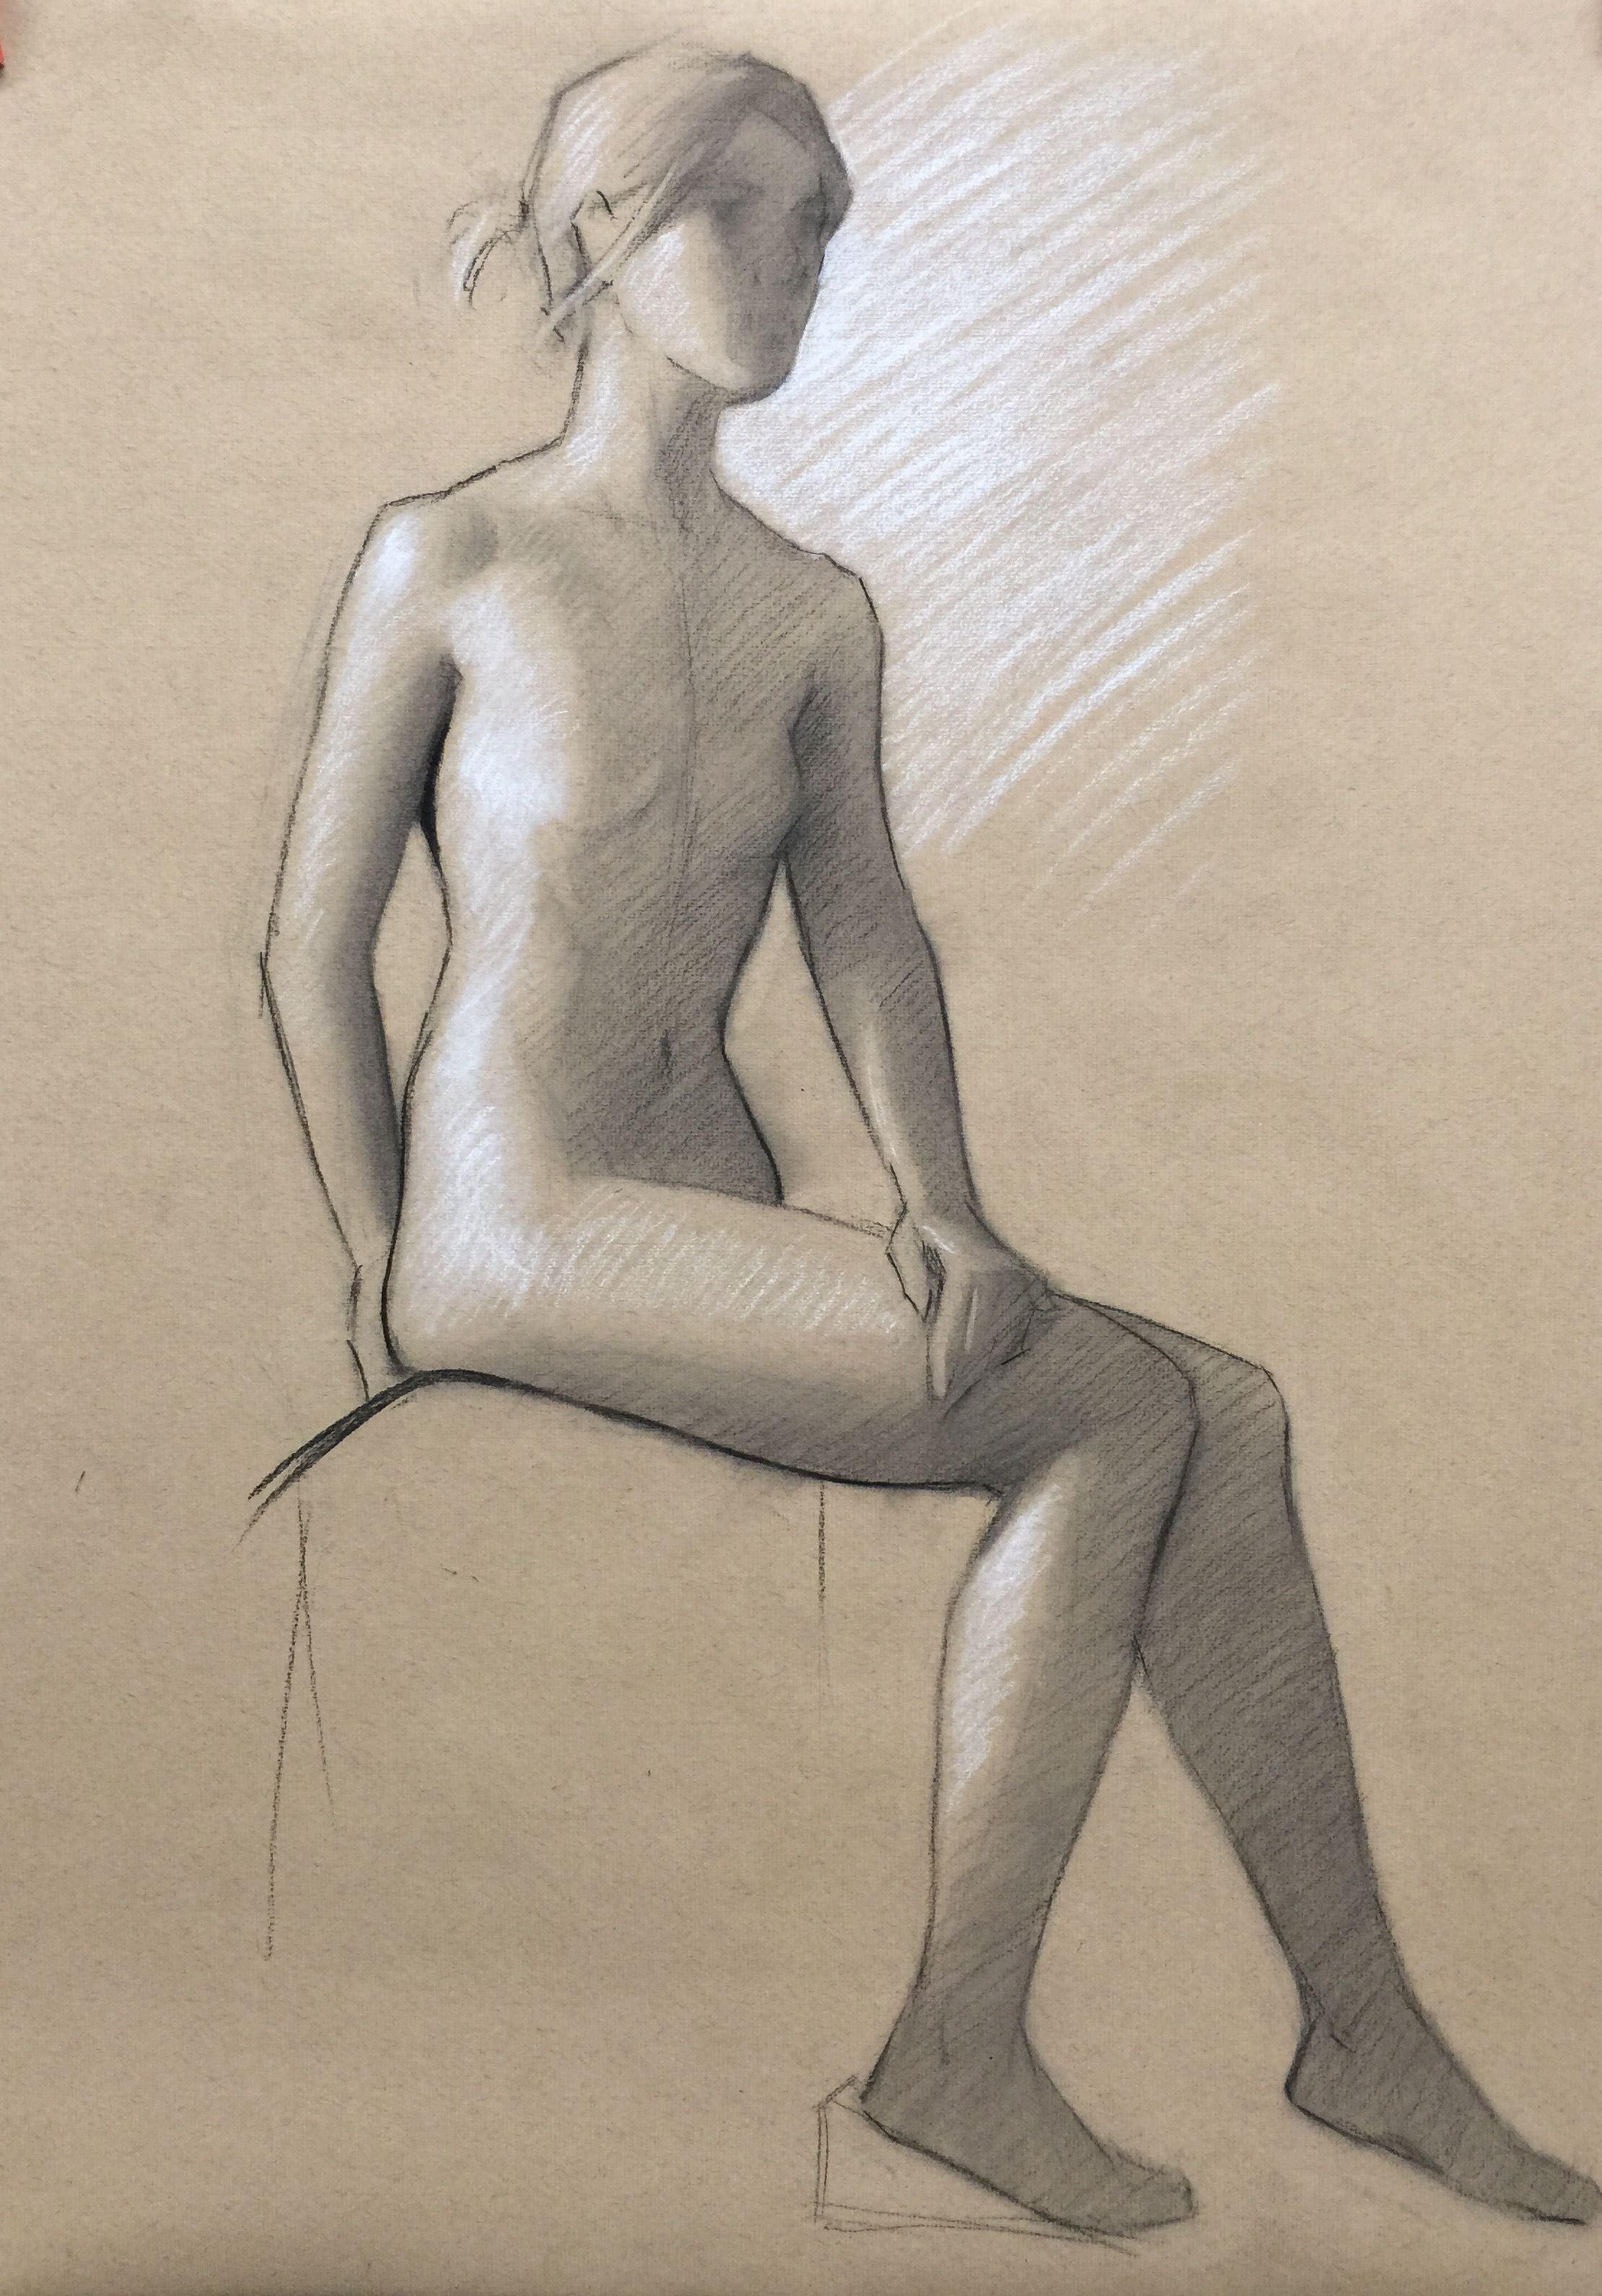 fullerton drawing